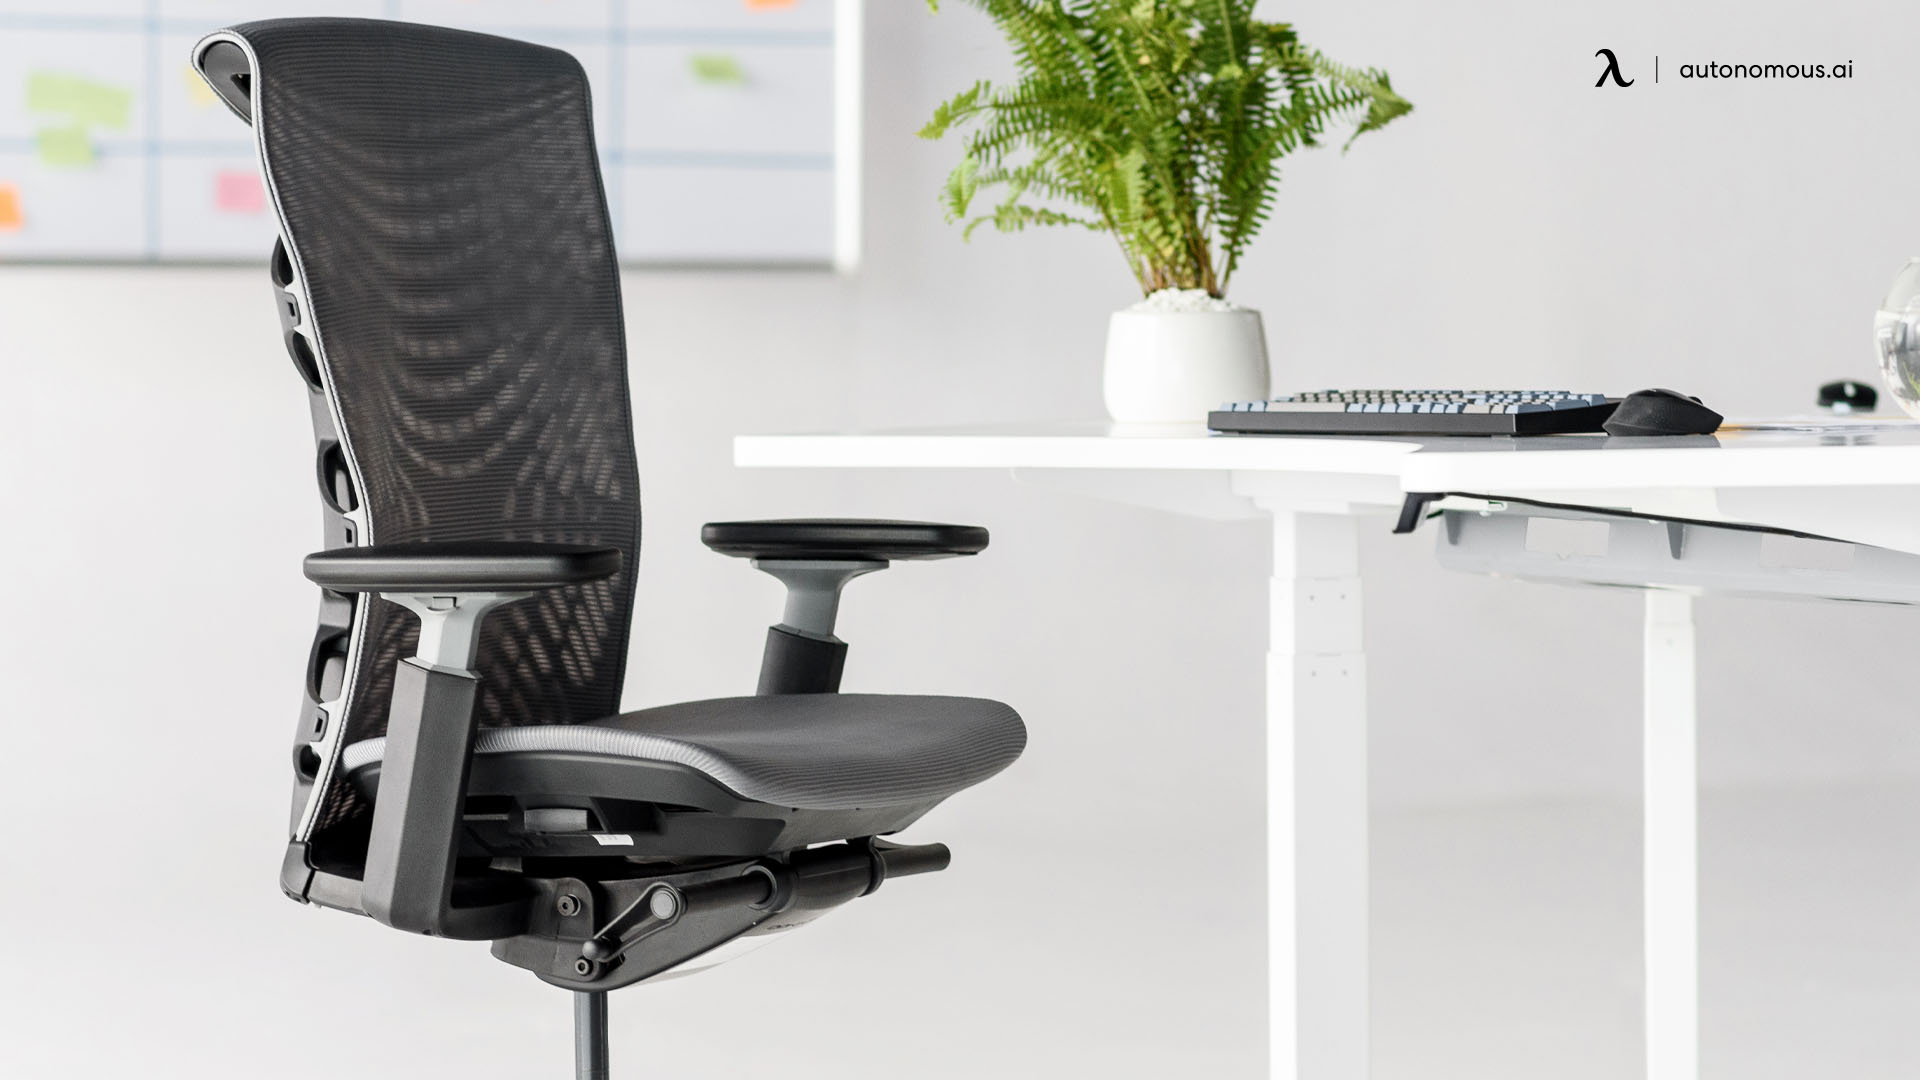 Ergonomic design of office chair